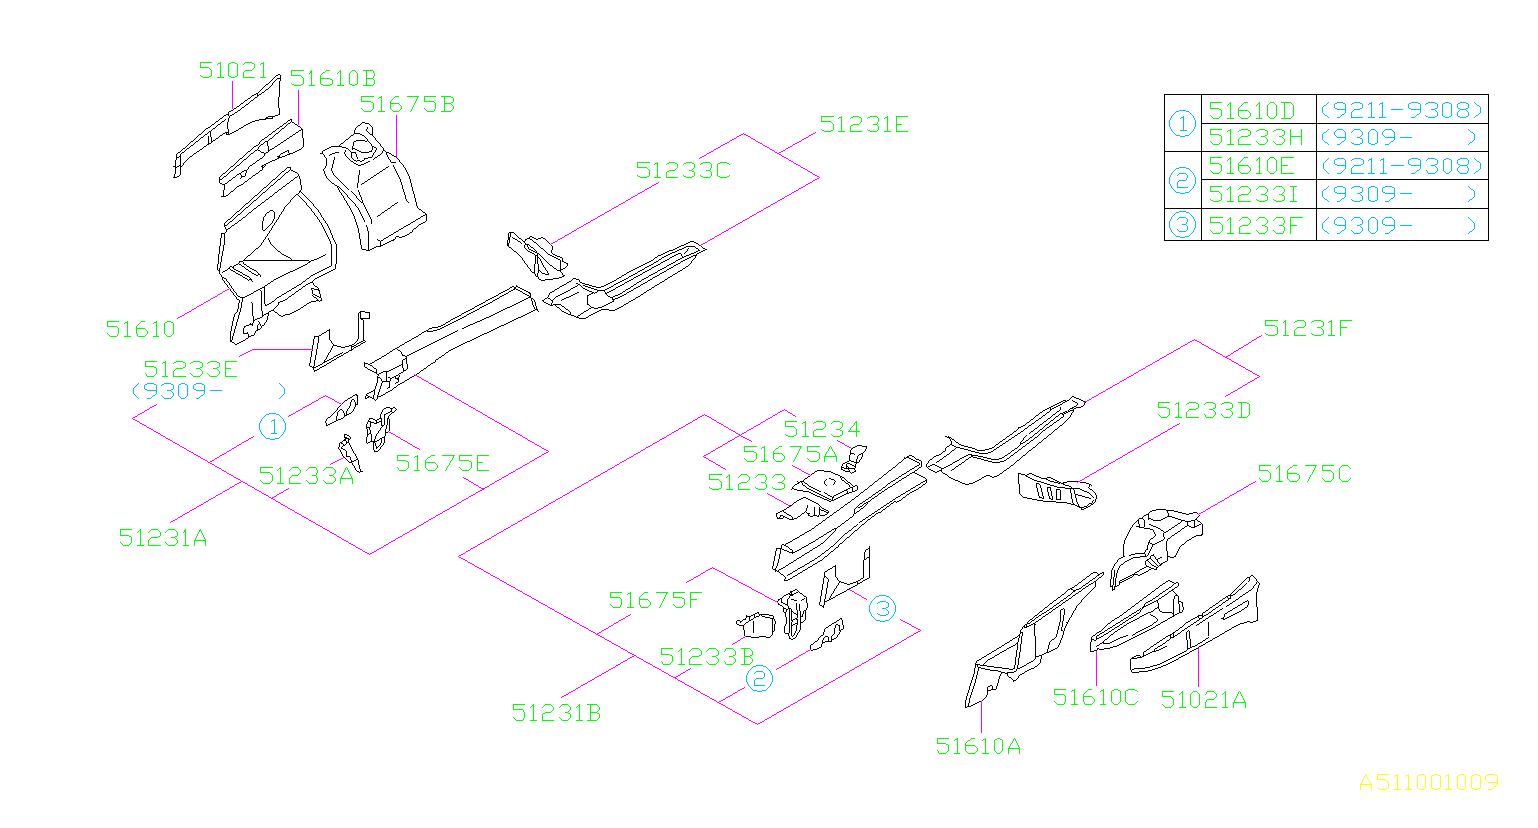 Subaru       Impreza    Reinforcementapron lower  right Wheel  body  51233AC520   Kirby    Subaru     Ventura CA